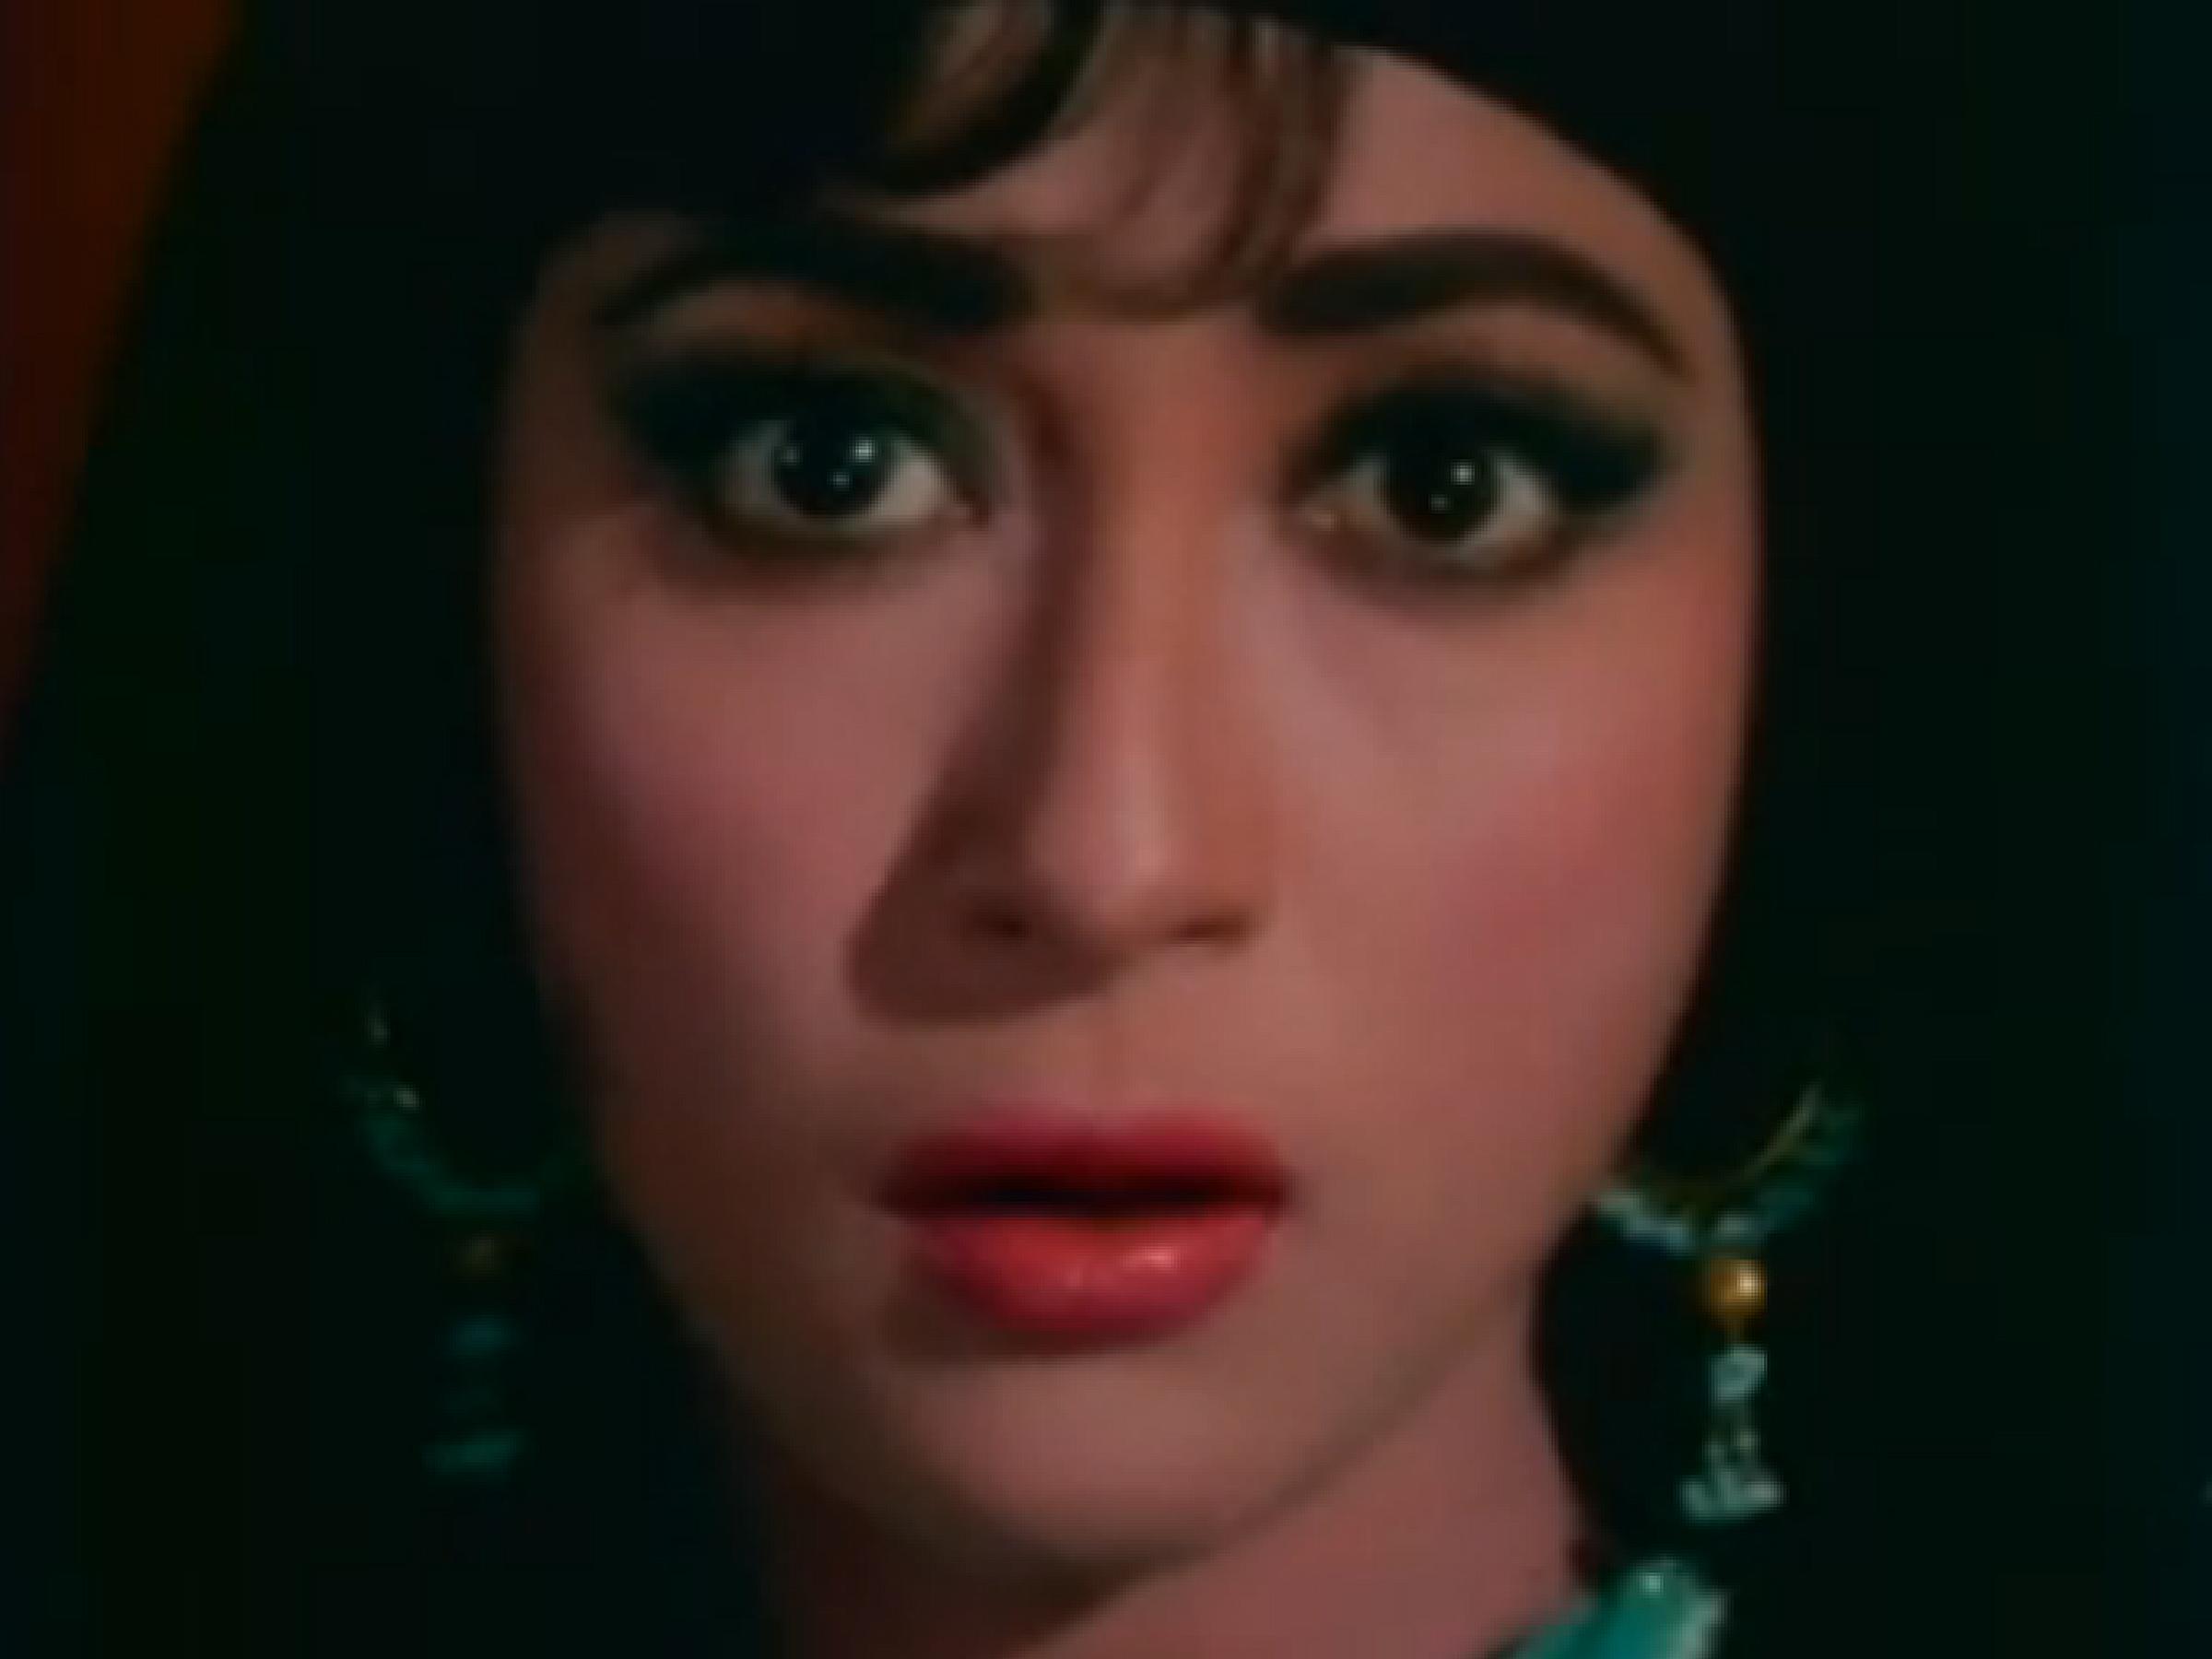 Yuzuki Aikawa (b. 1983),Kylie Bunbury Adult video Charles Lloyd-Pack (1902?983),Rosella Towne